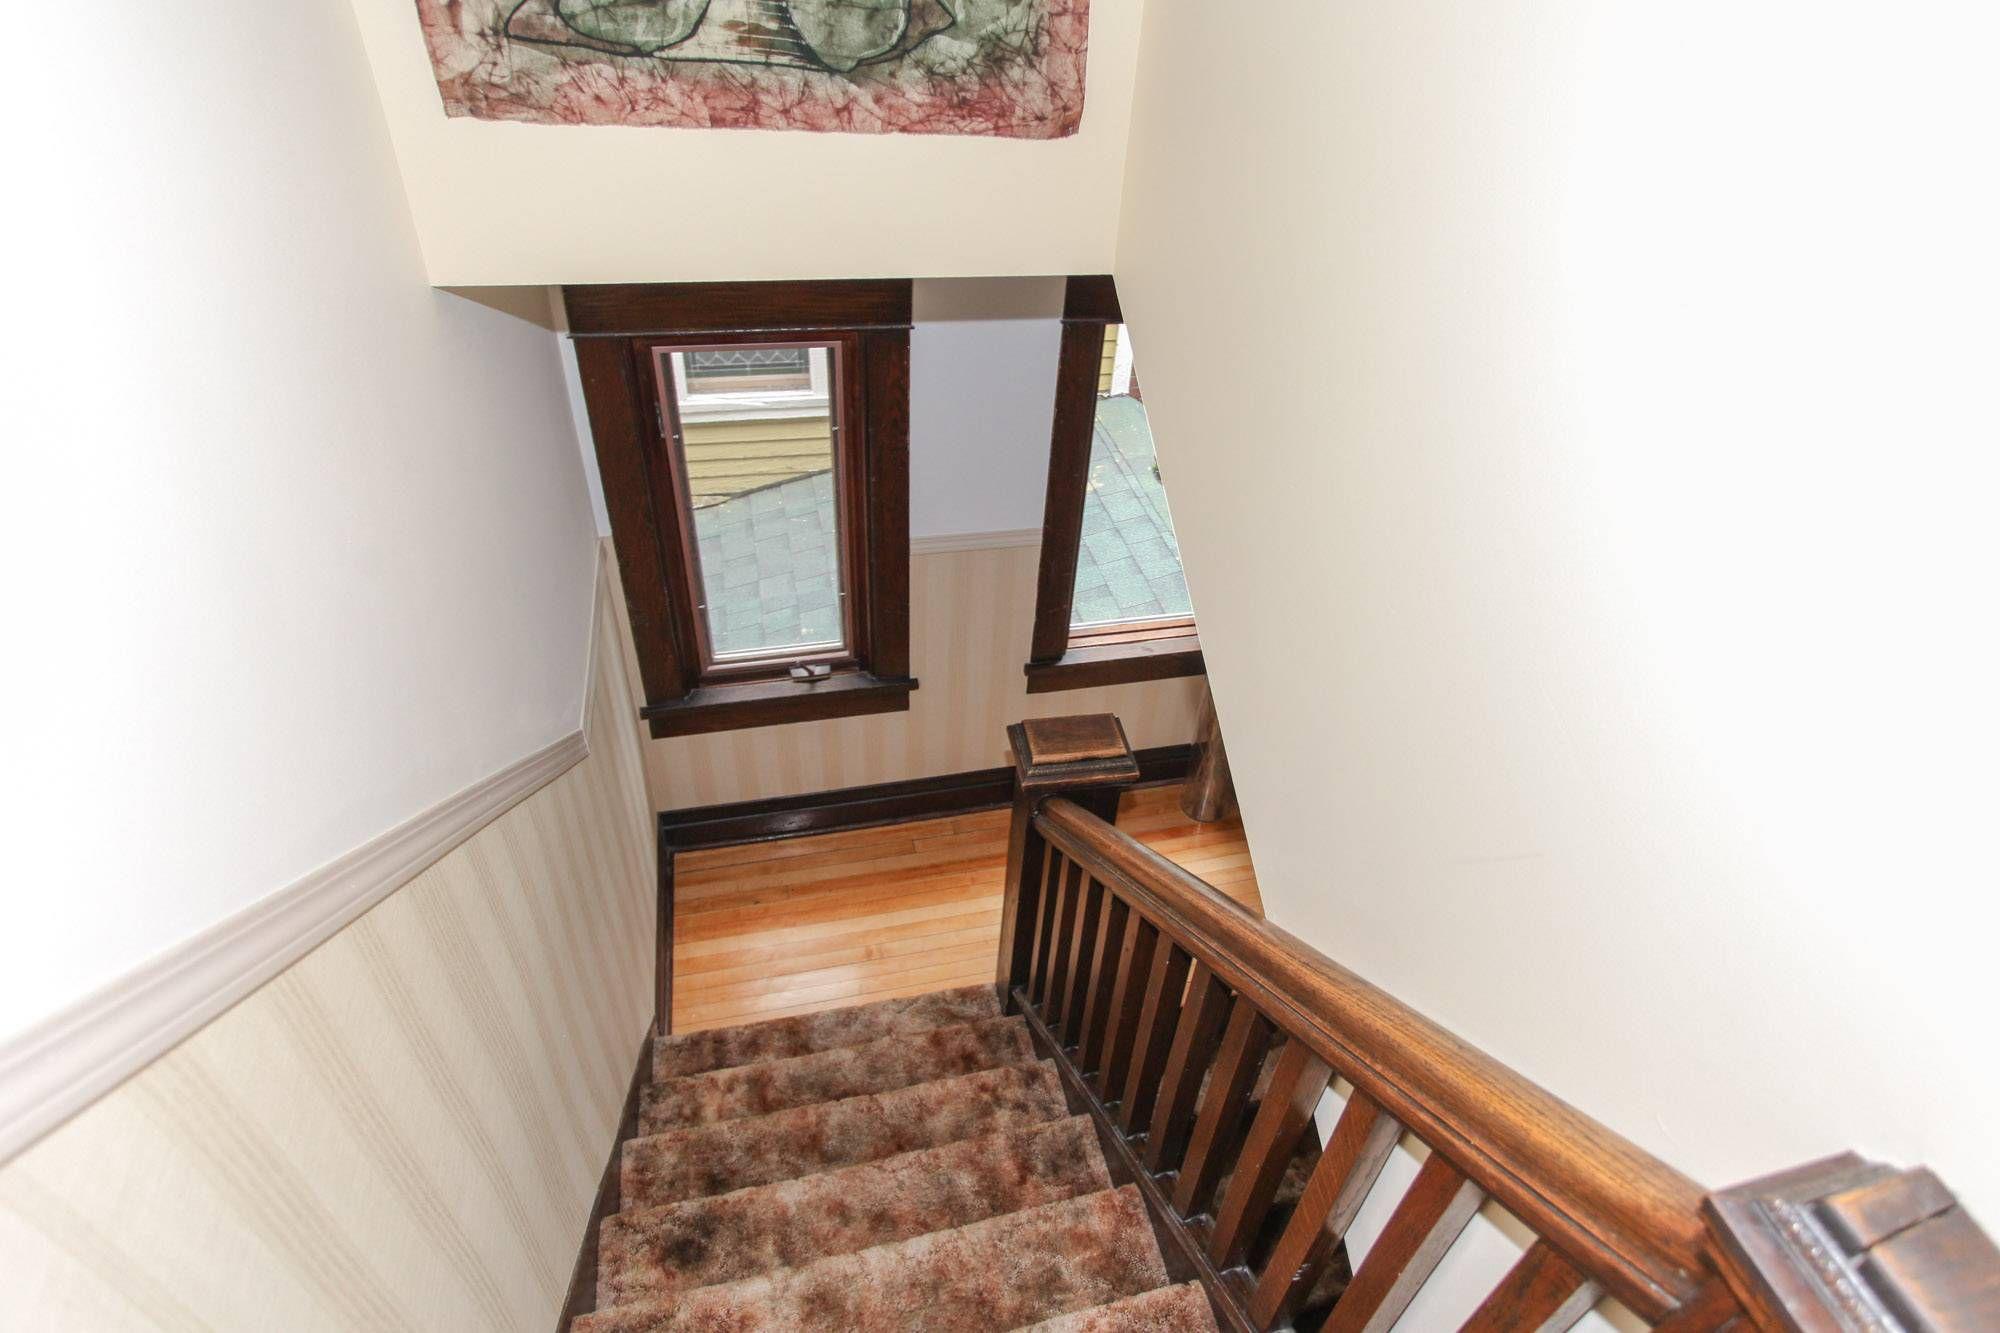 Photo 26: Photos: 4 83 Lenore Street in Winnipeg: Wolseley Condo for sale (5B)  : MLS®# 1917991